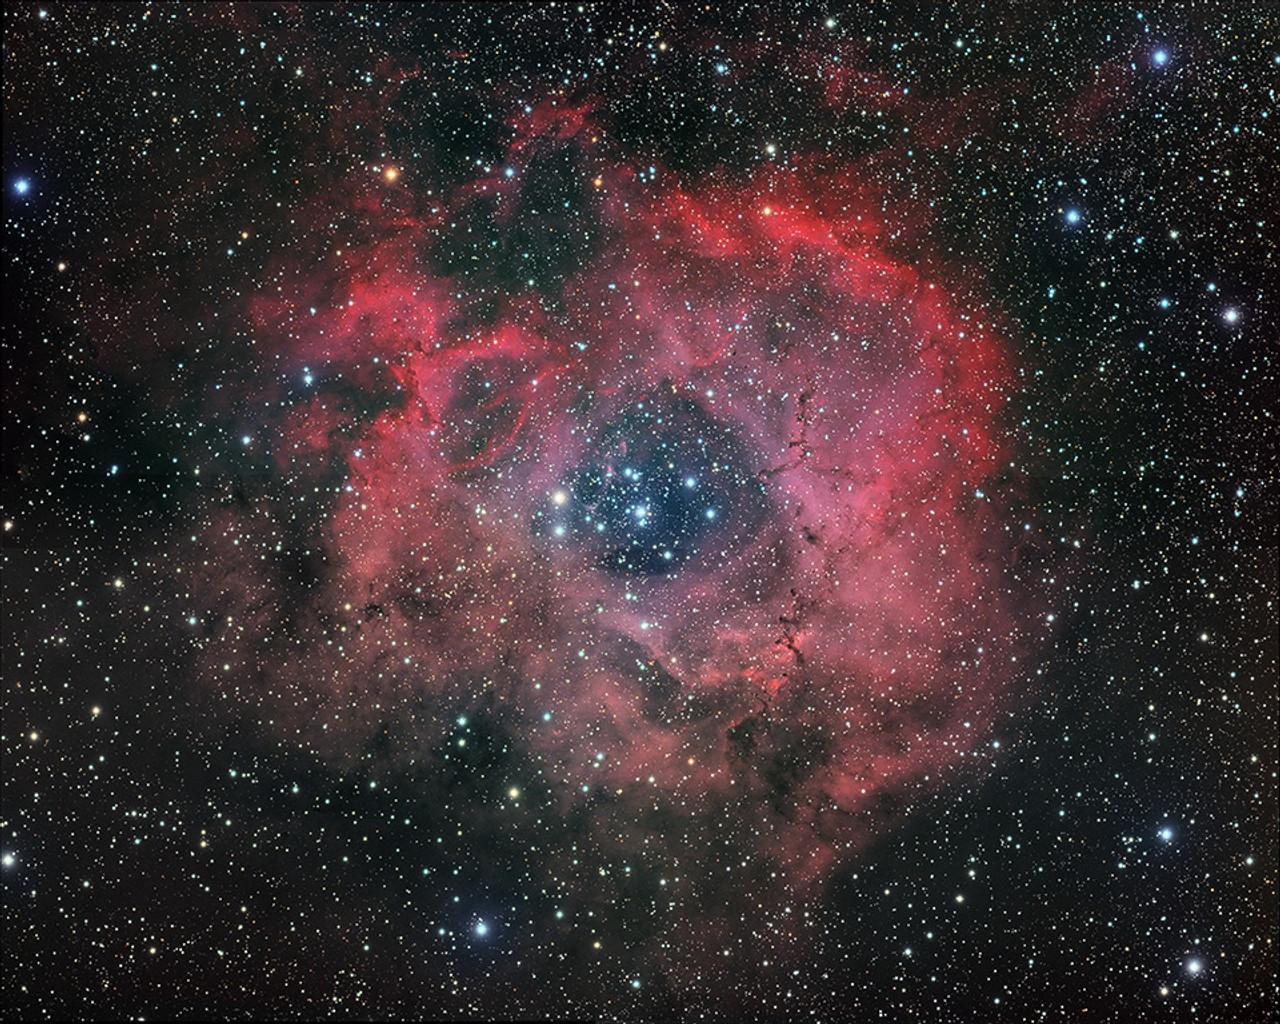 Rosette Nebula, Douglas Lalla